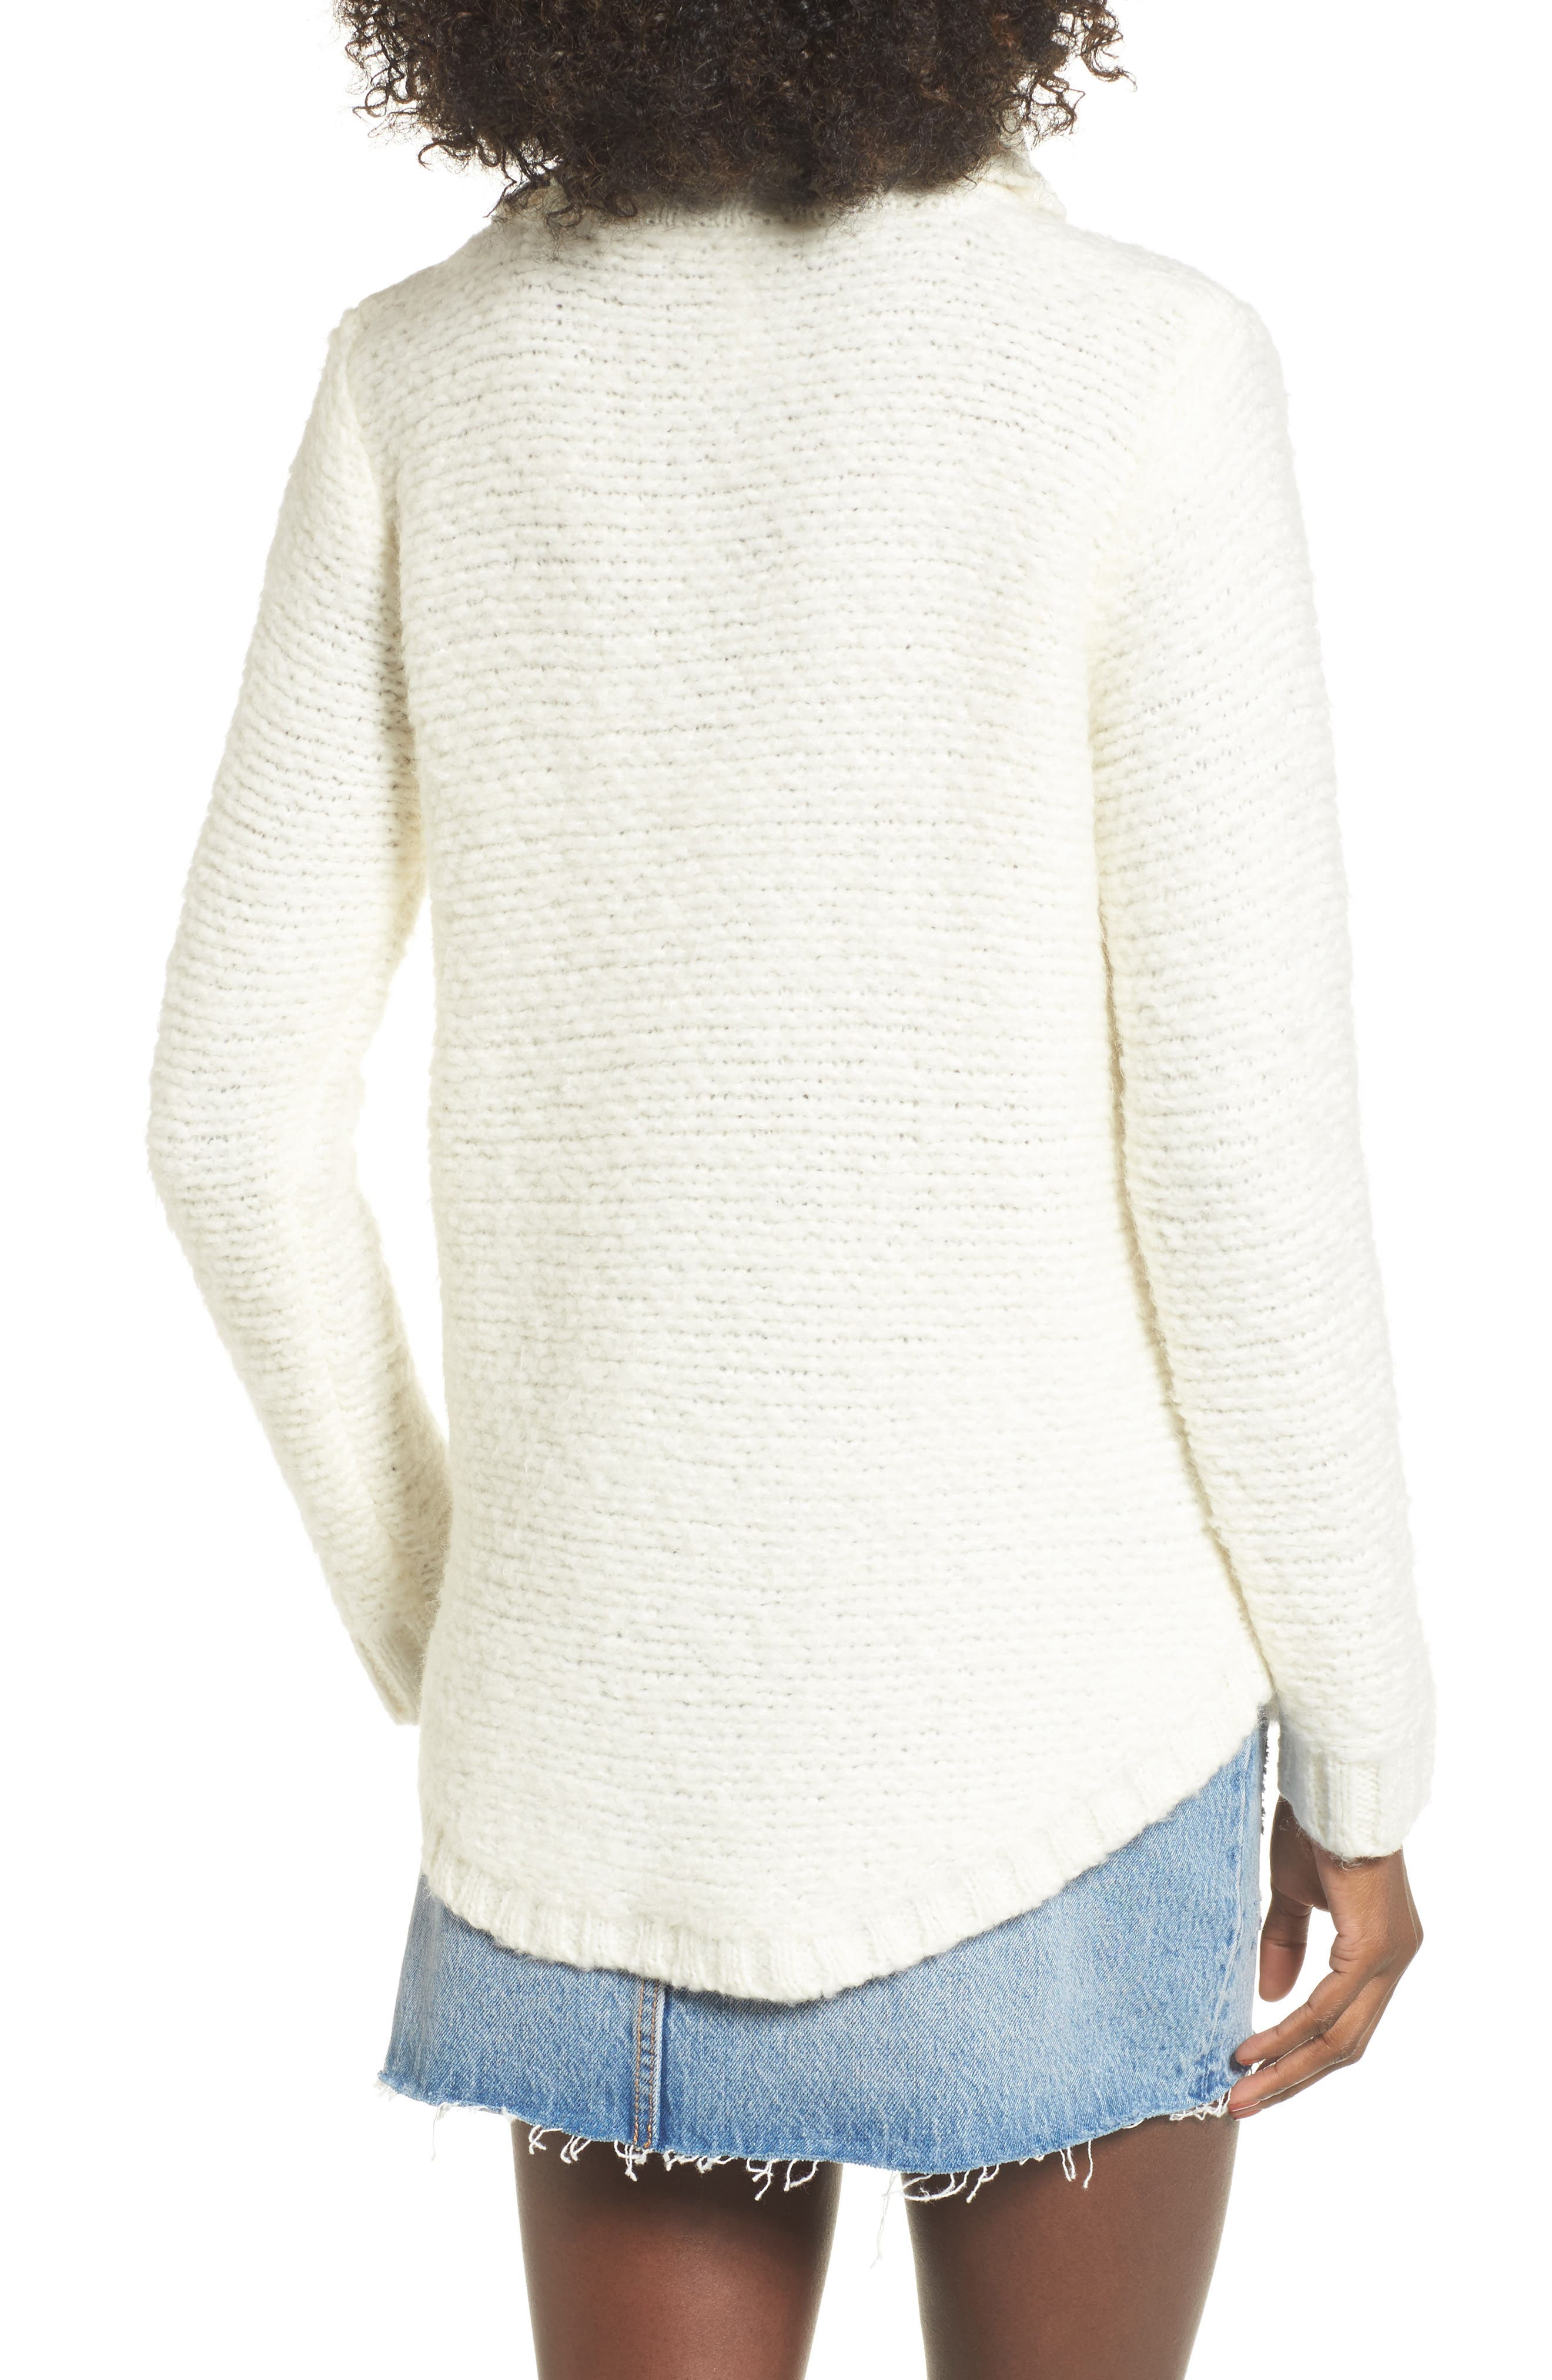 Kinks Turtleneck Sweater,                             Alternate thumbnail 4, color,